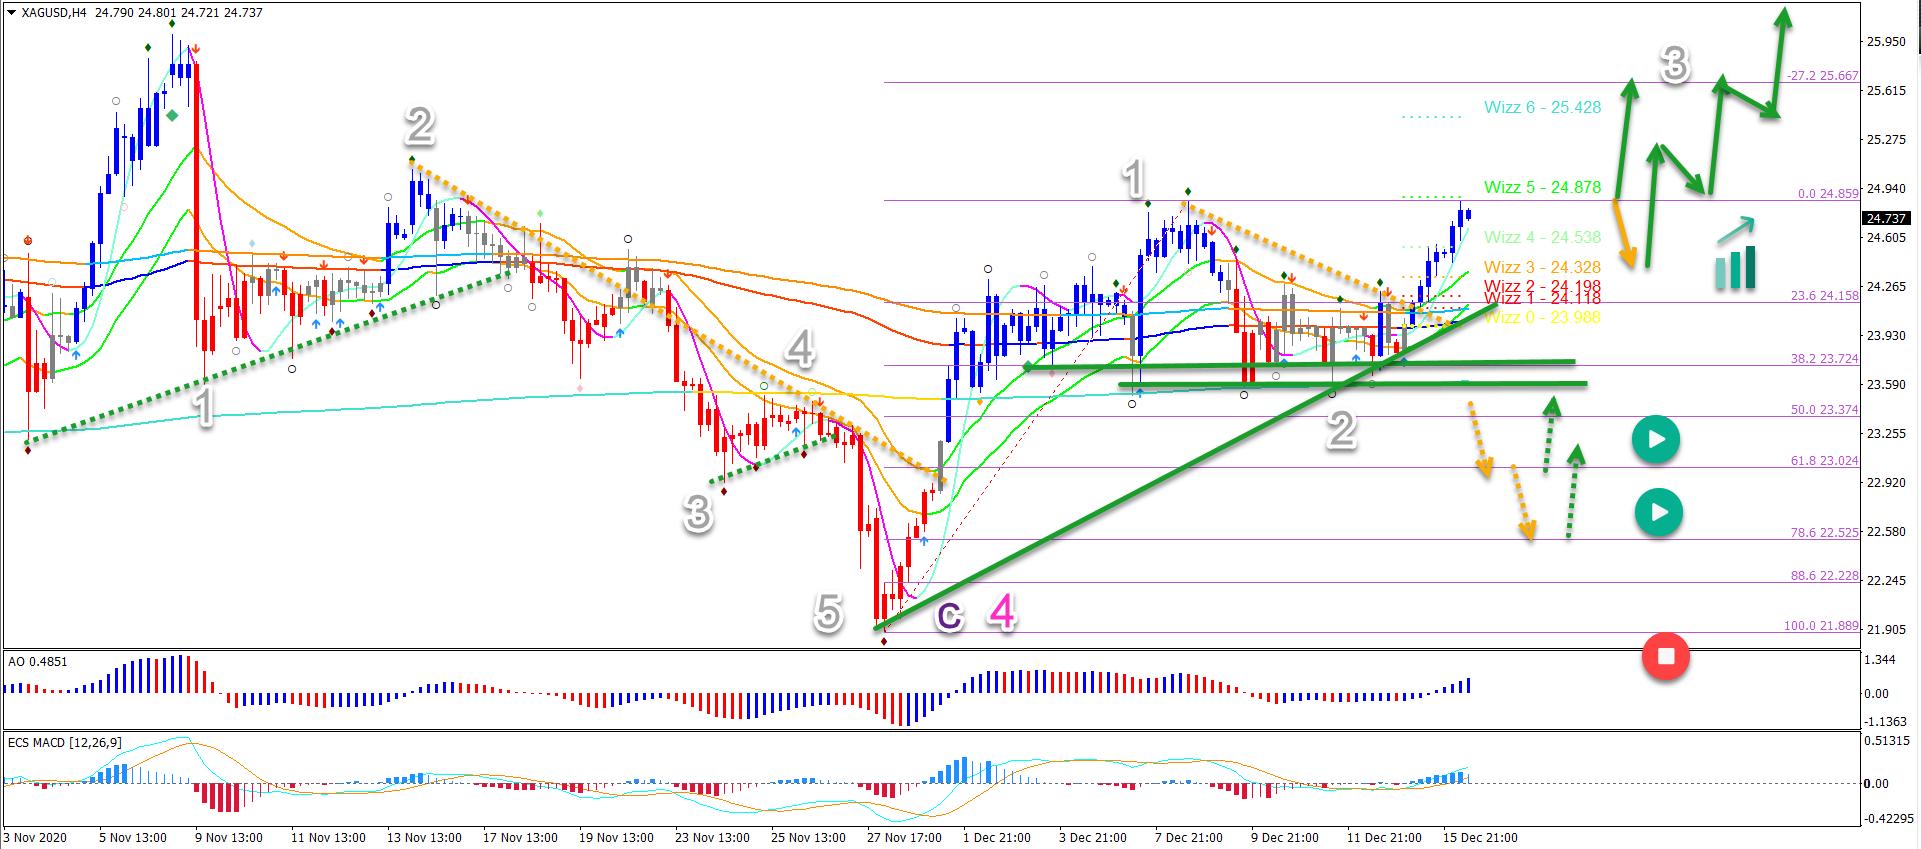 XAG/USD 16.12.2020 4 hour chart